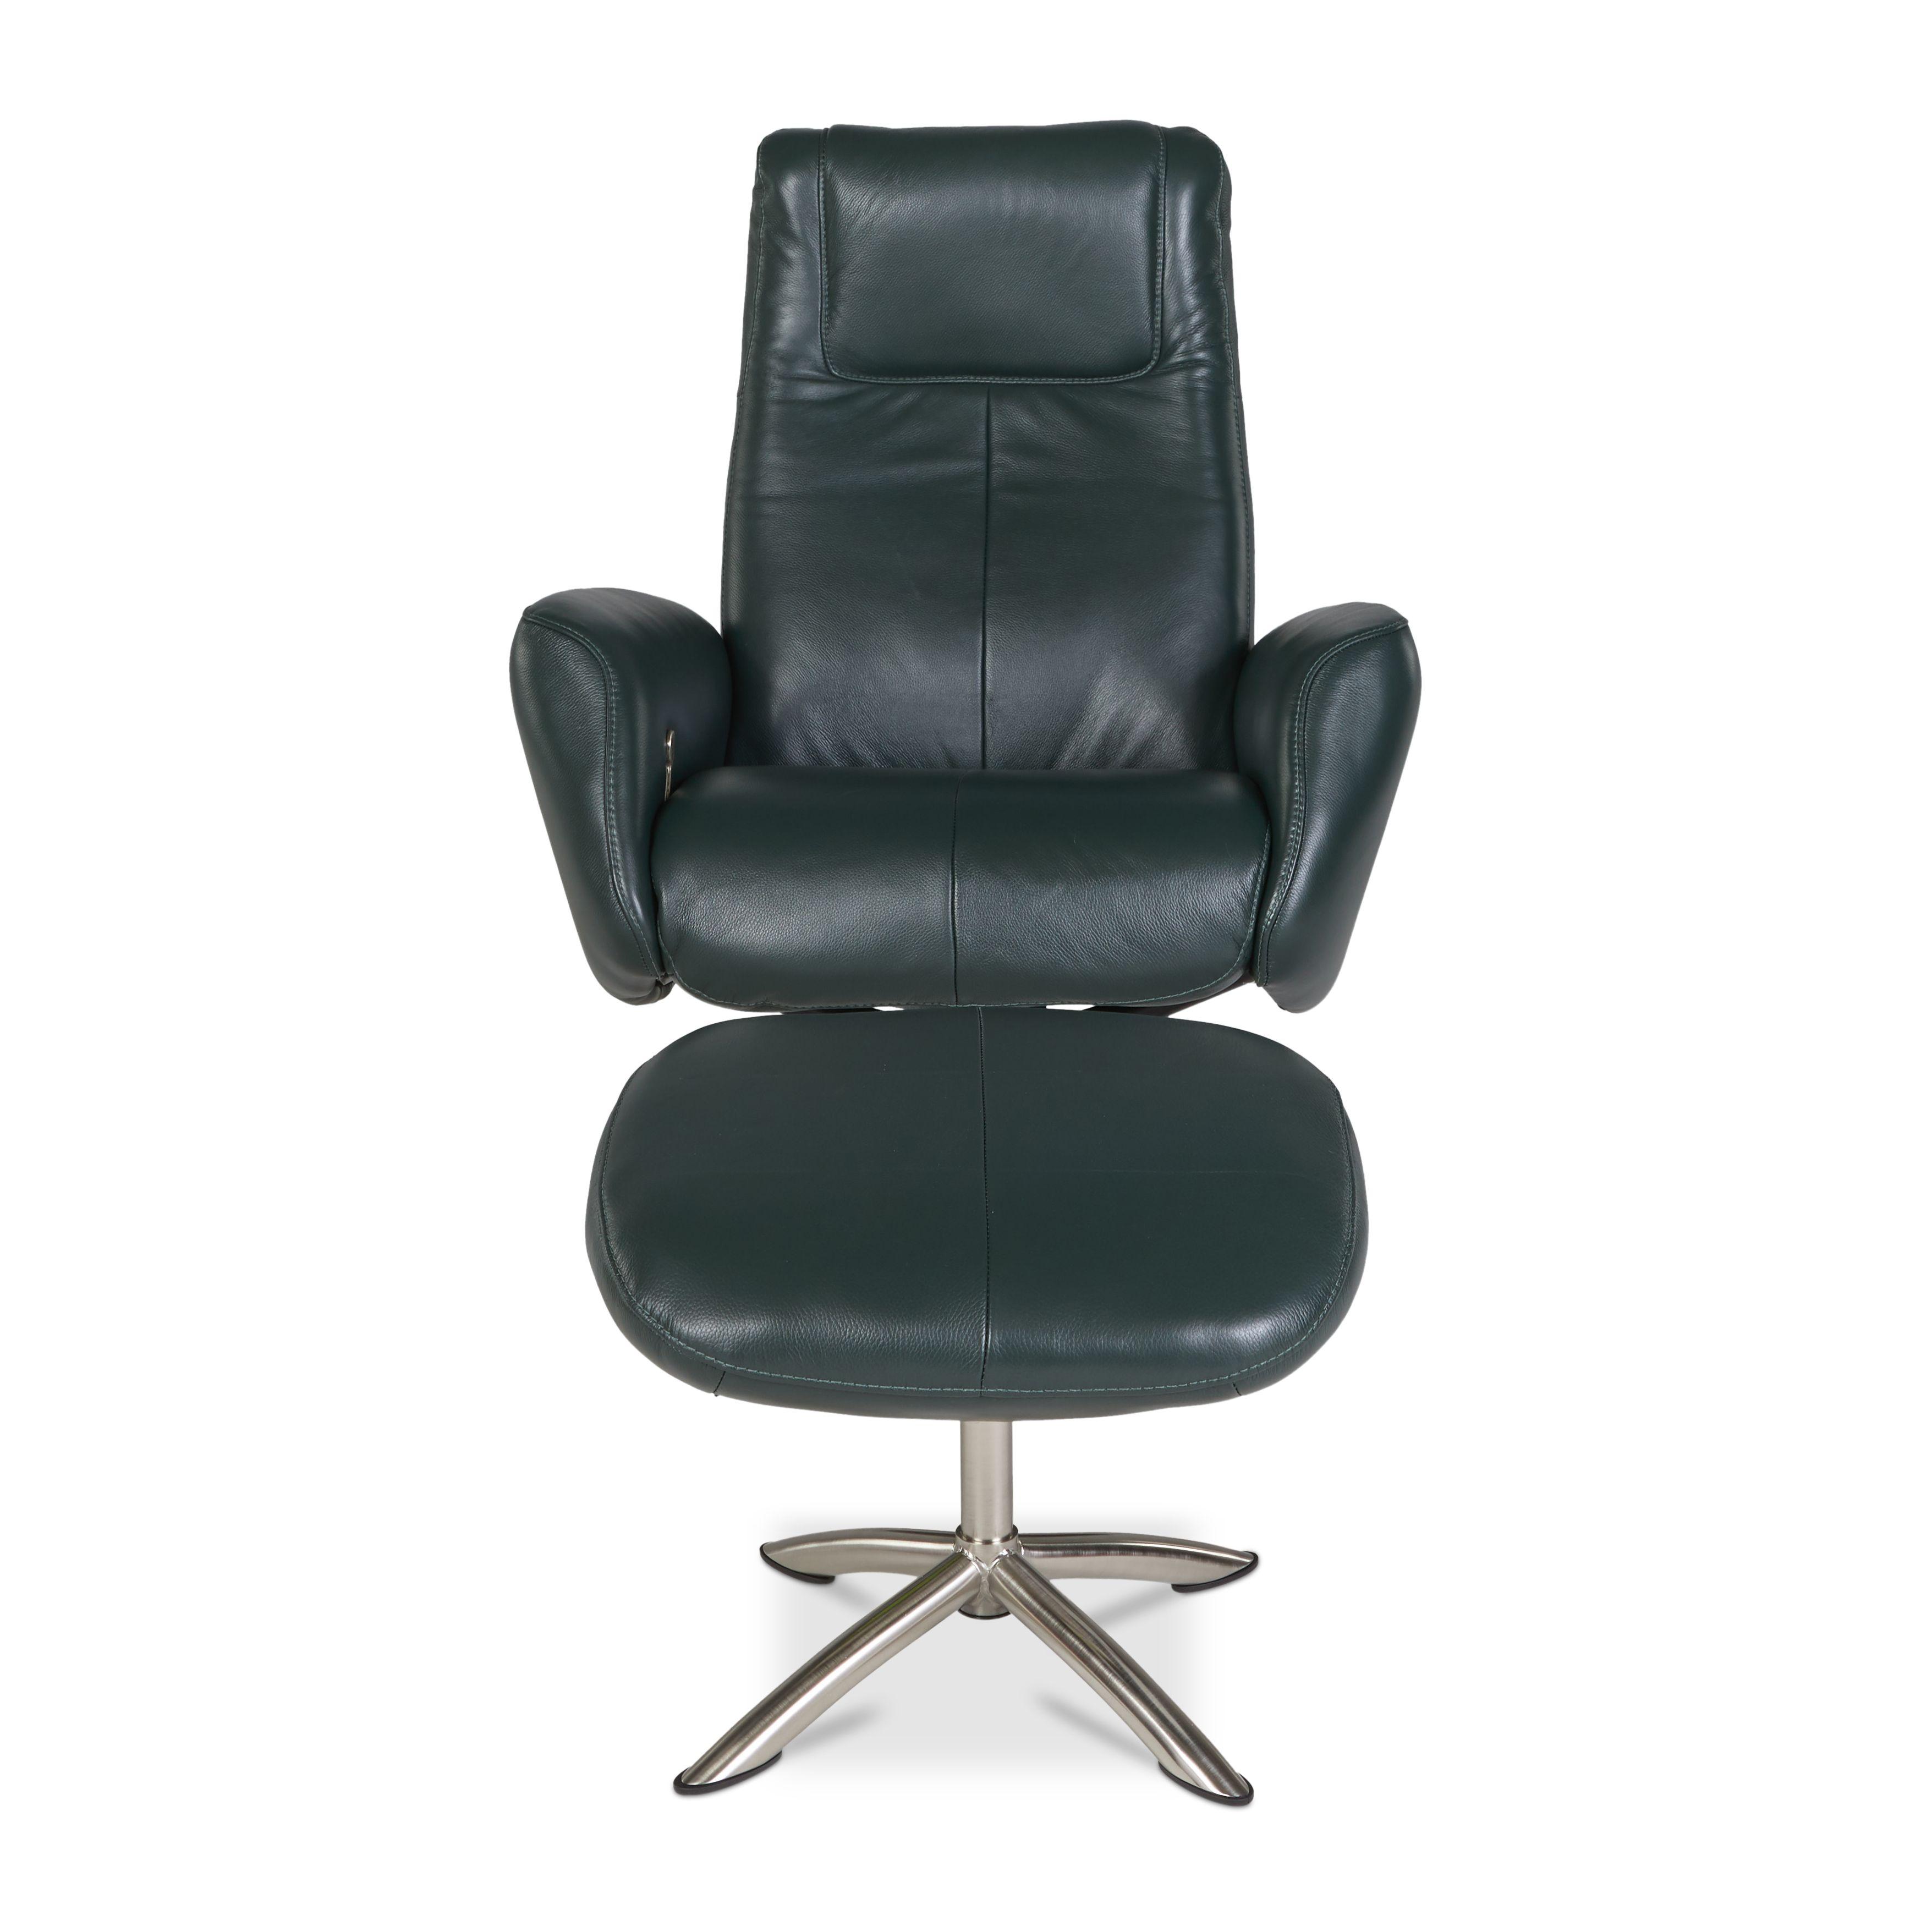 Qo5 Chair & Ottoman Chair, ottoman, Chair, ottoman set